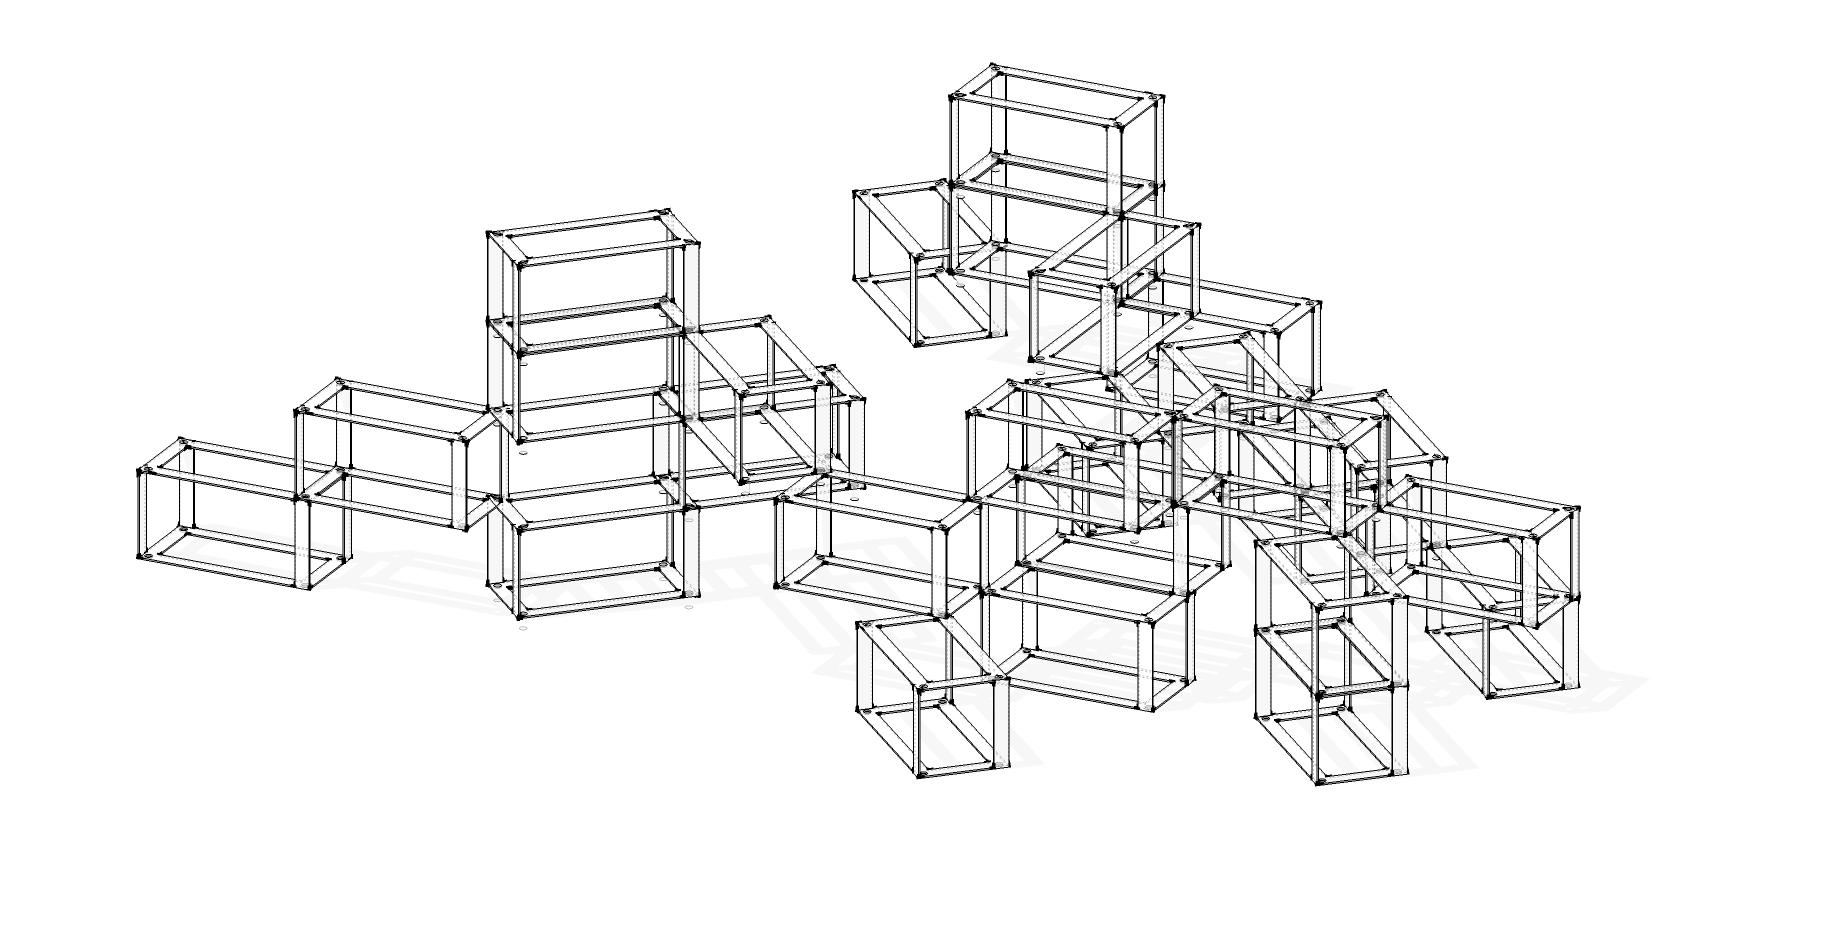 Open Design School Toyota Camry Parts Diagram 19